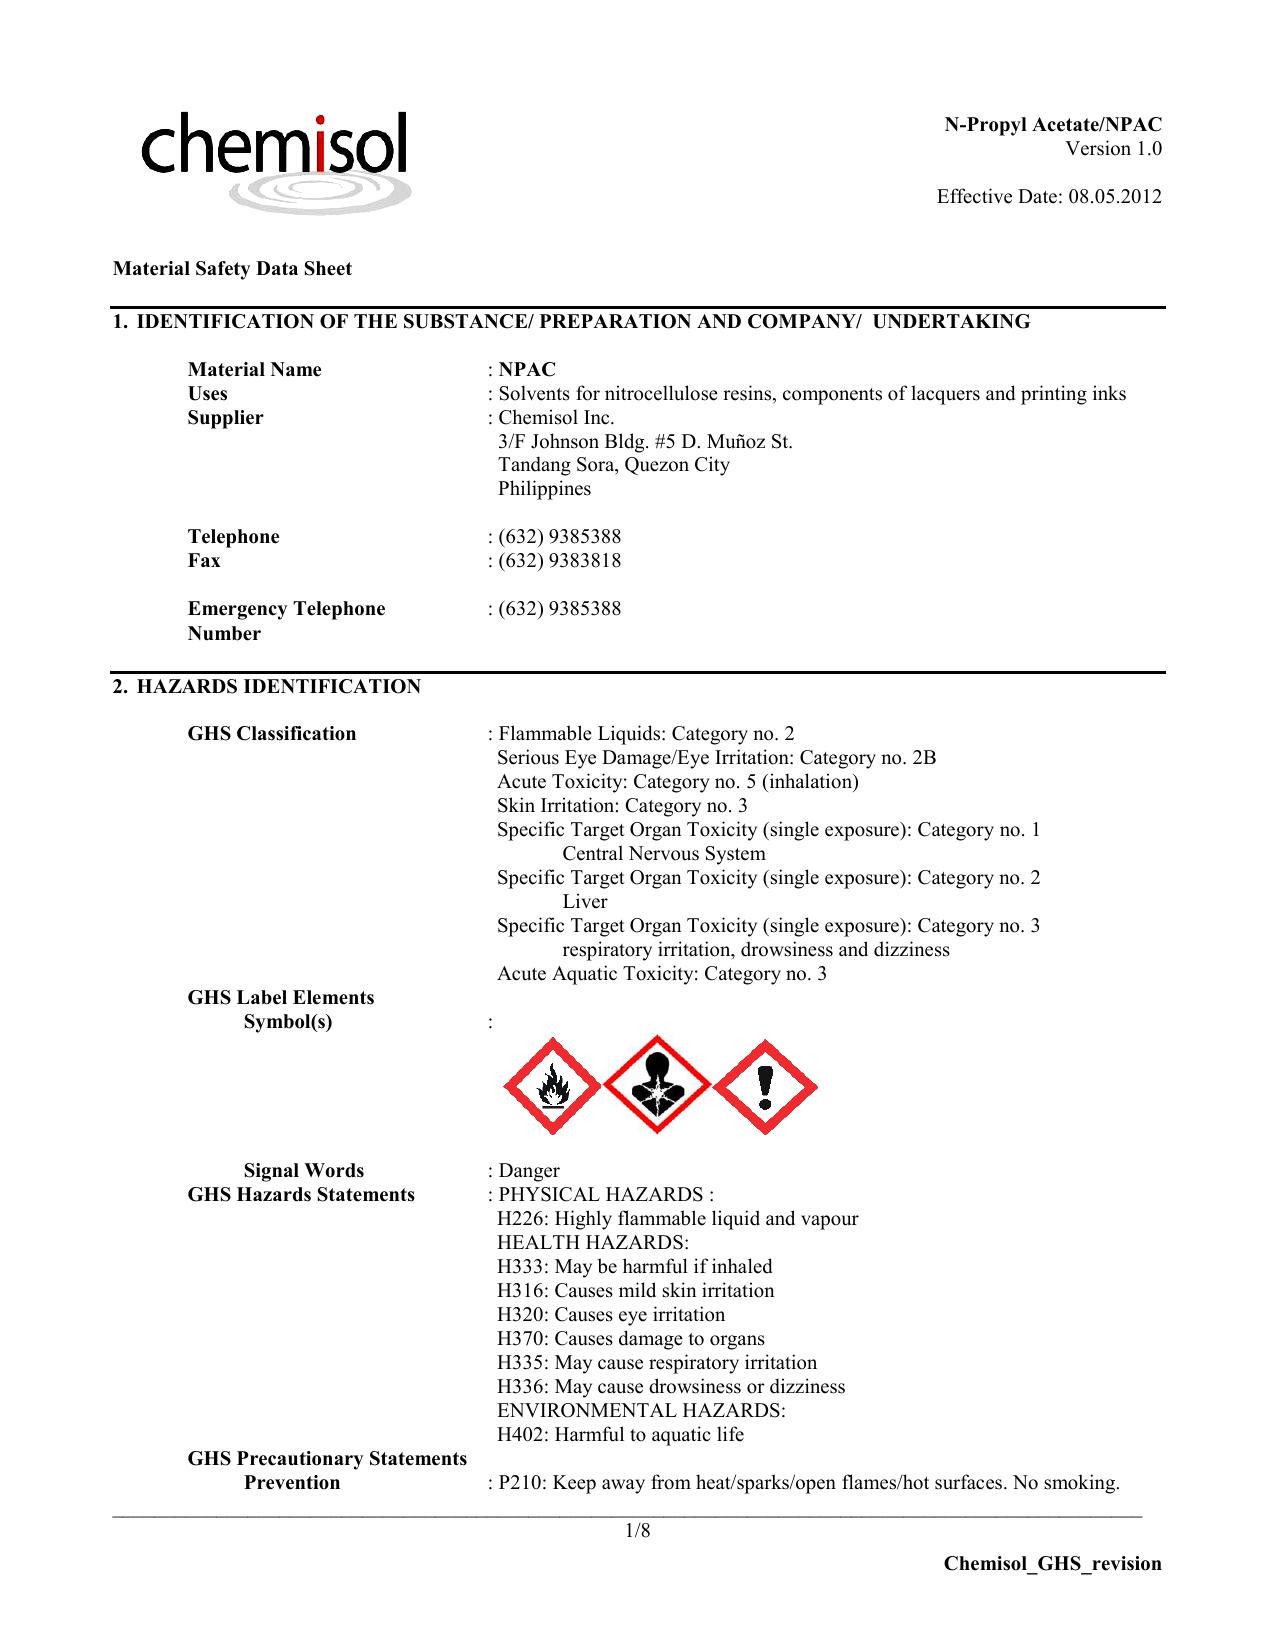 Chemisol_GHS_revision N-Propyl Acetate/NPAC Version 1 0